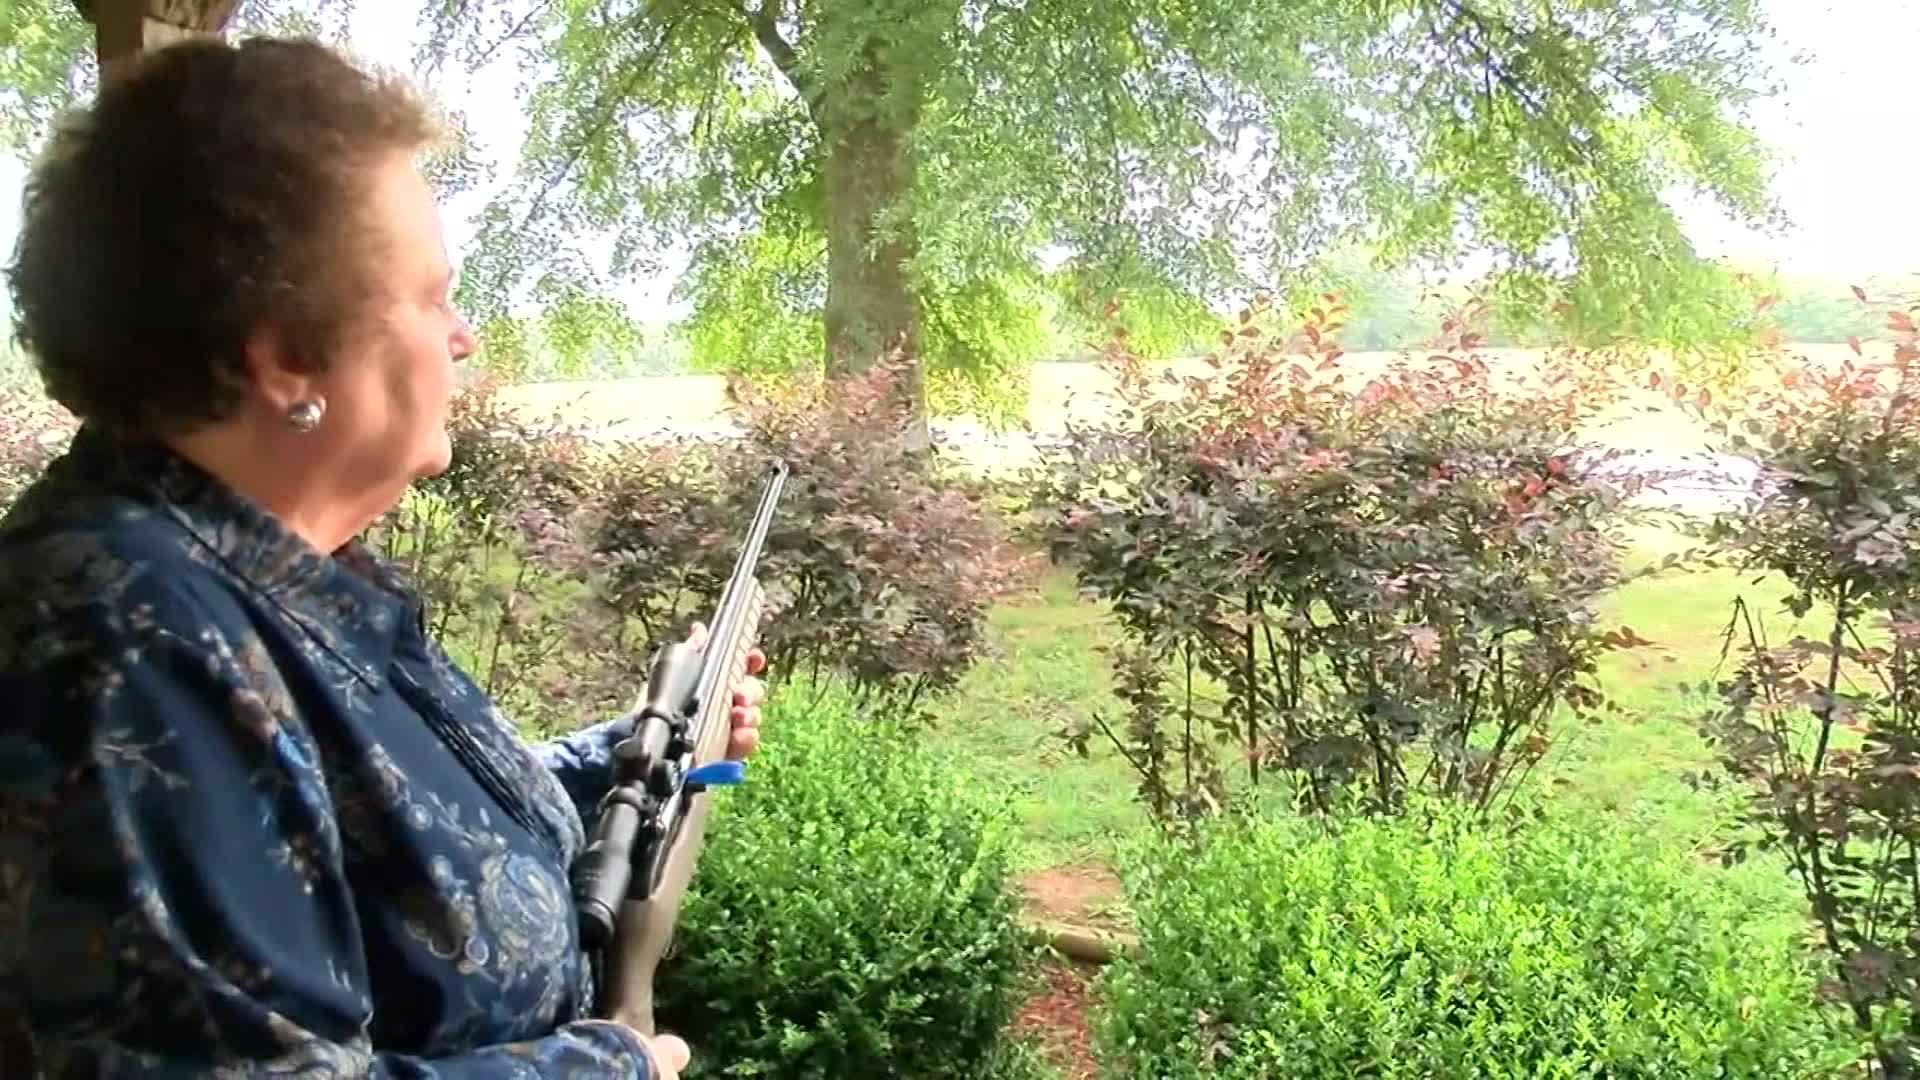 Alabama granny grabs her gun, helps take down suspect